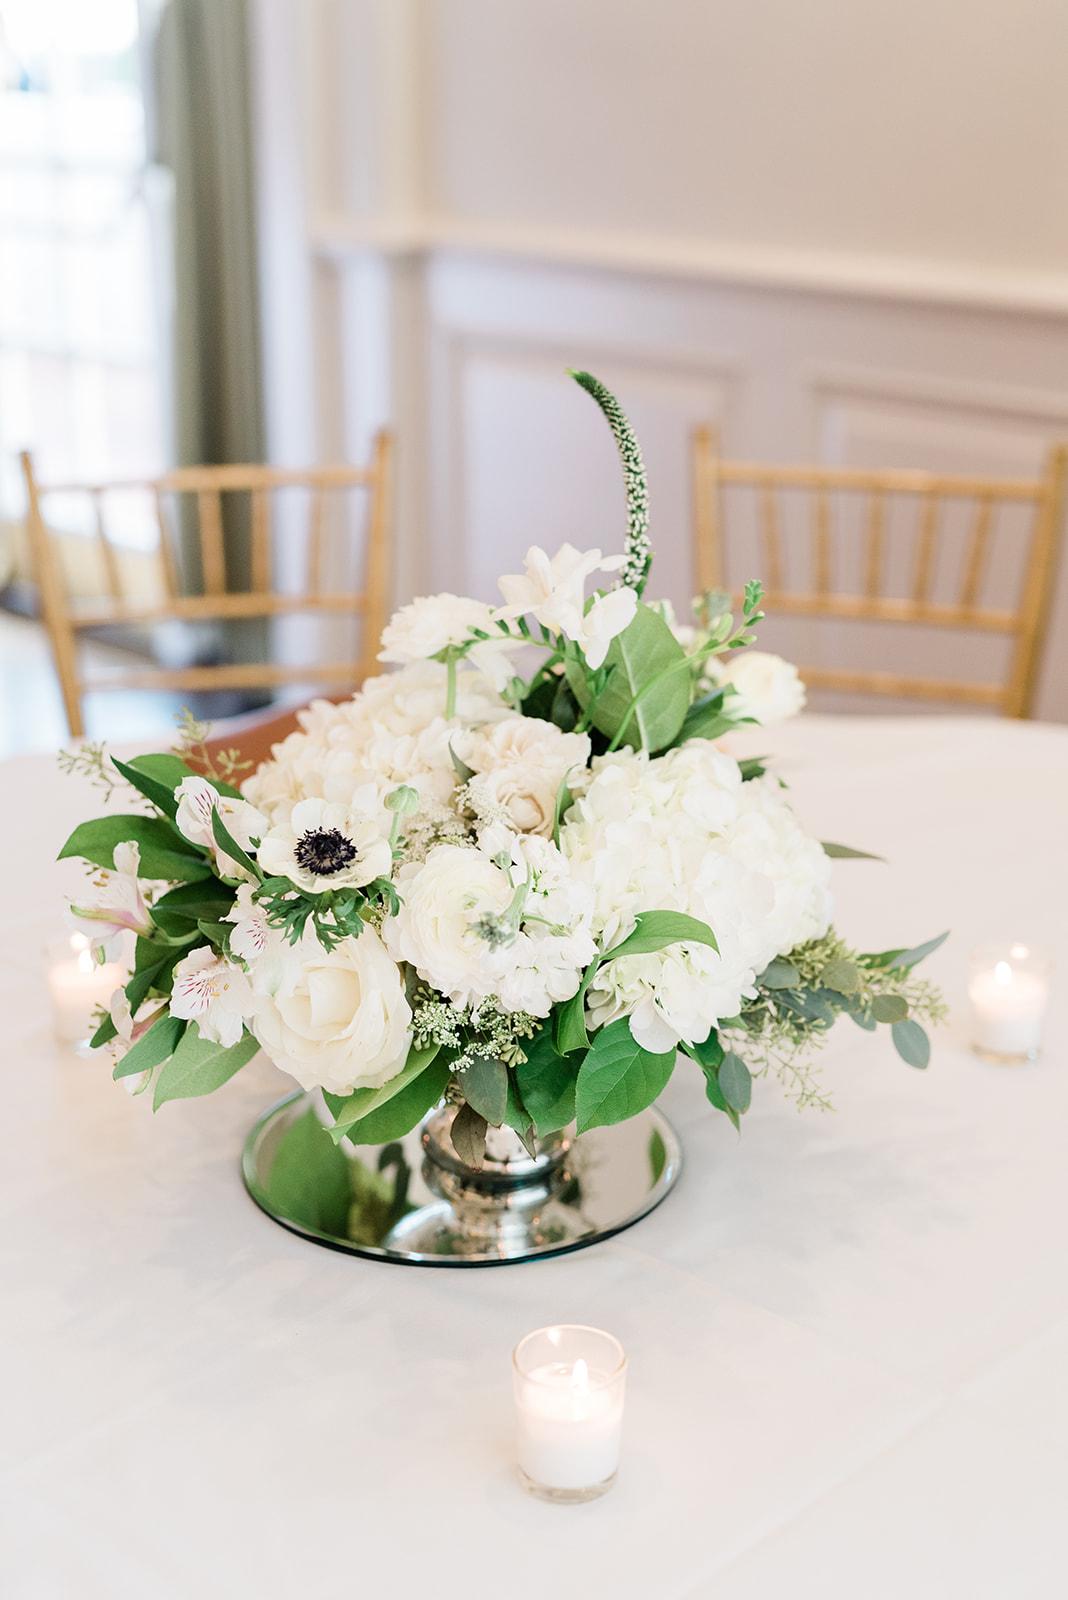 Reception centerpiece | Birmingham, Alabama wedding | Taylor Dane Photography | Custom wedding invitations by Little Fox Paperie | Gracie Nunez